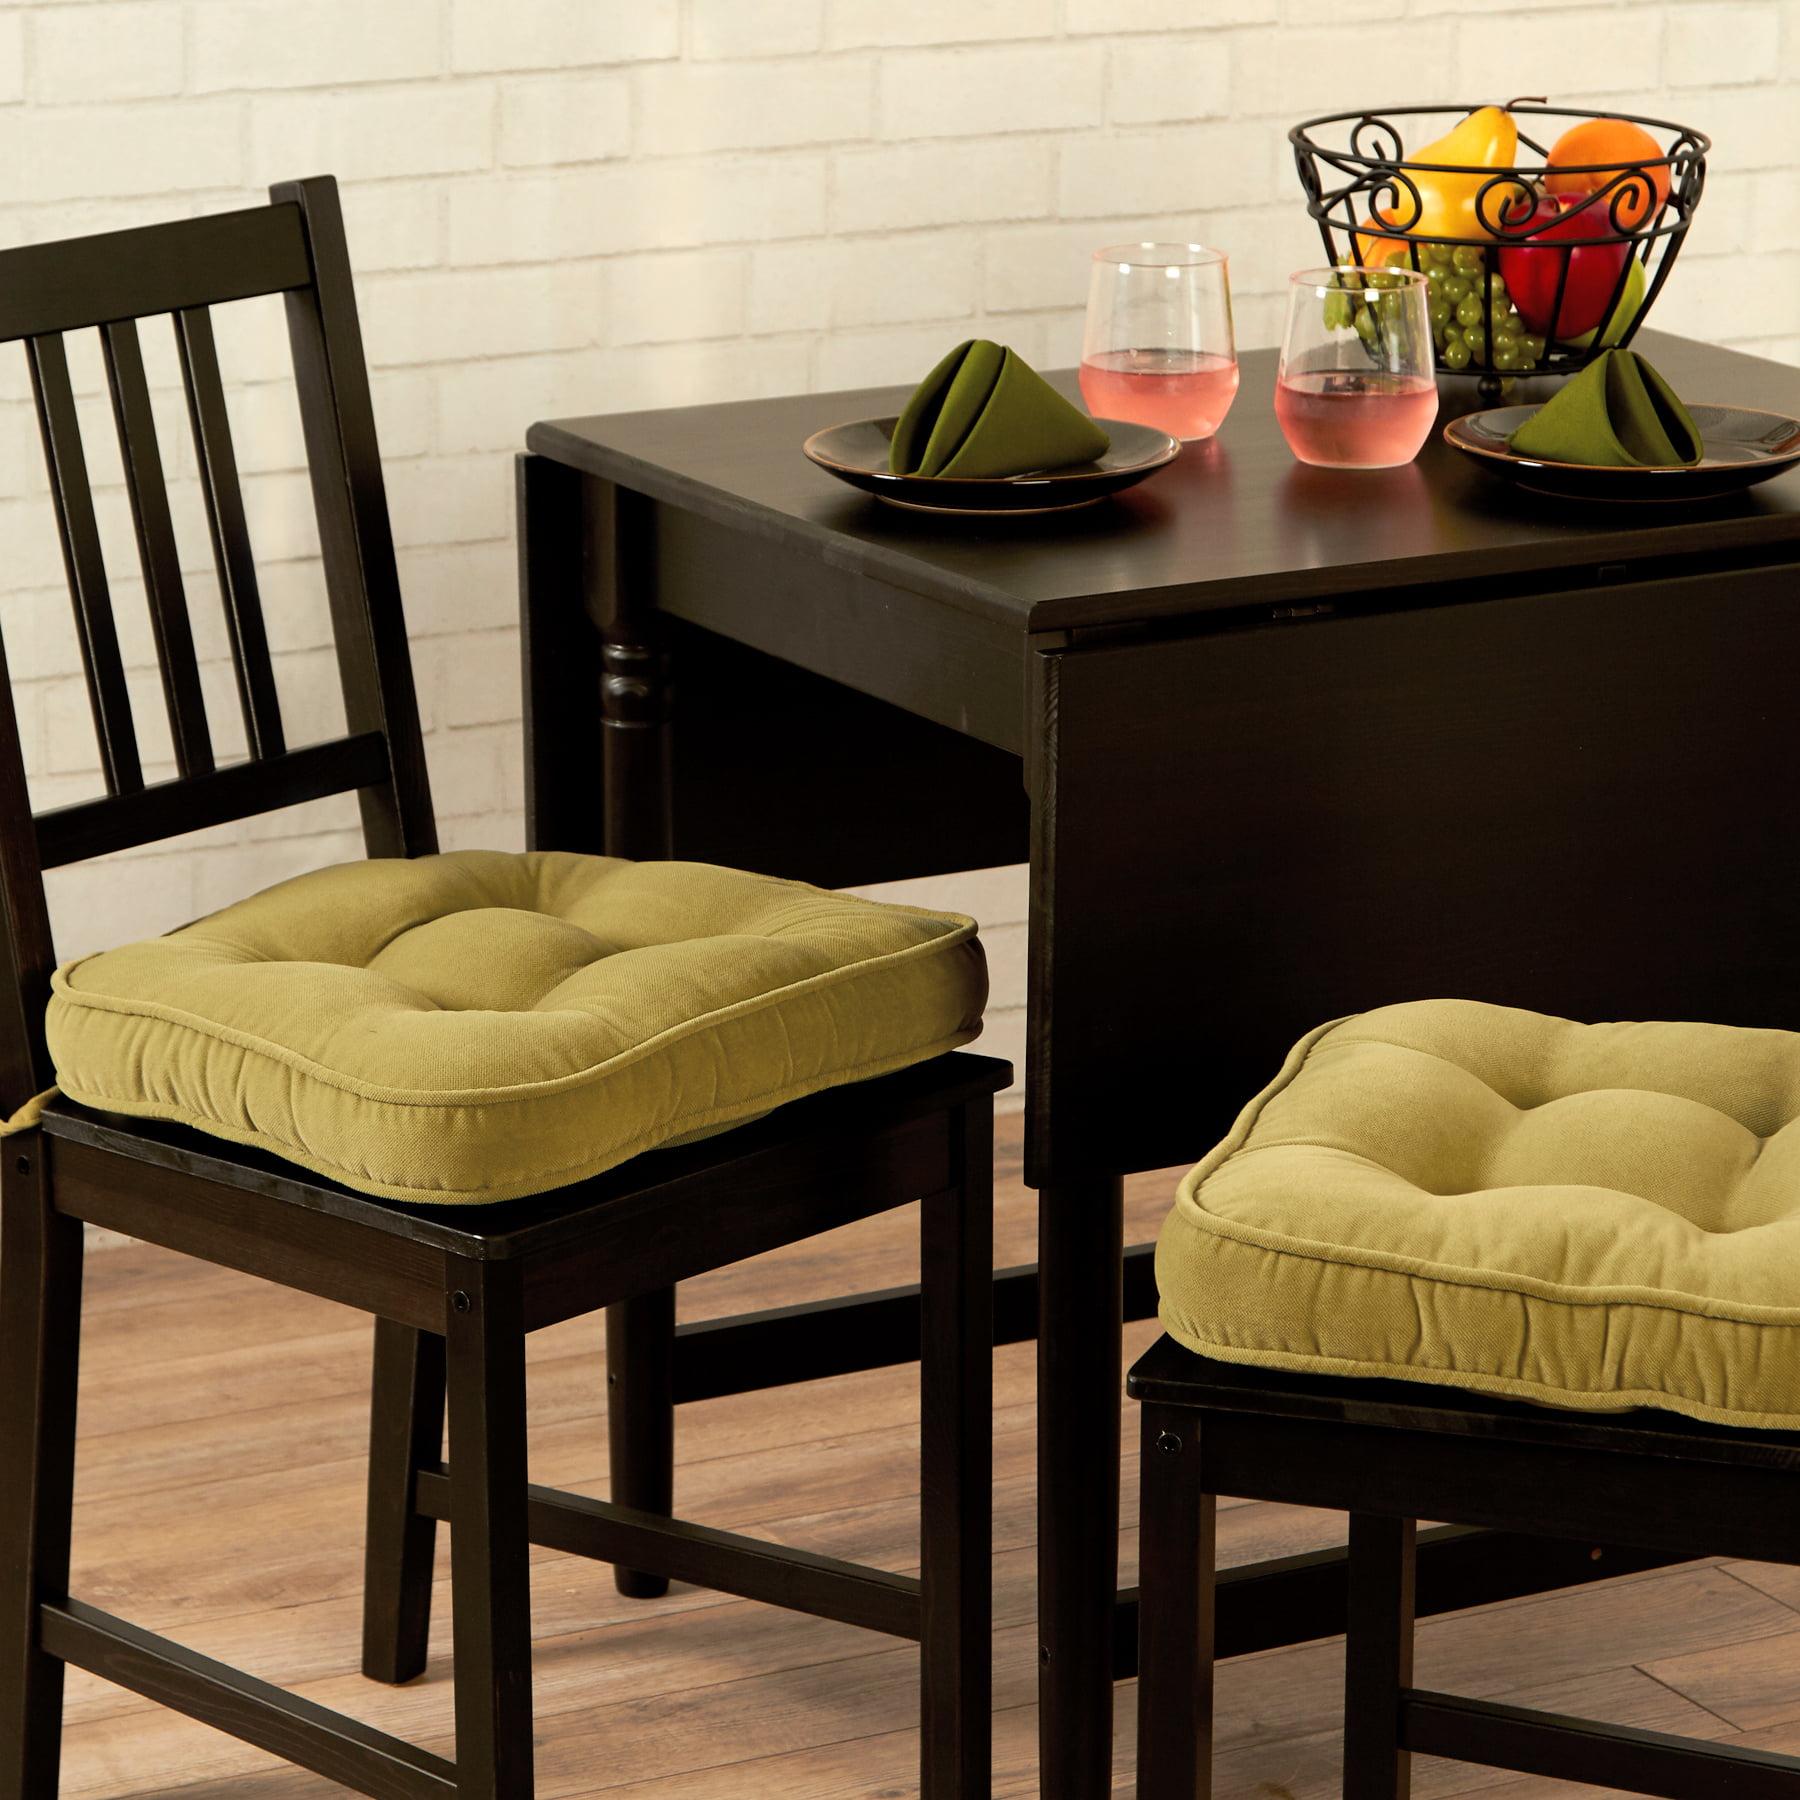 hyatt 17 x 15 in. indoor chair cushion, set of 2 - walmart